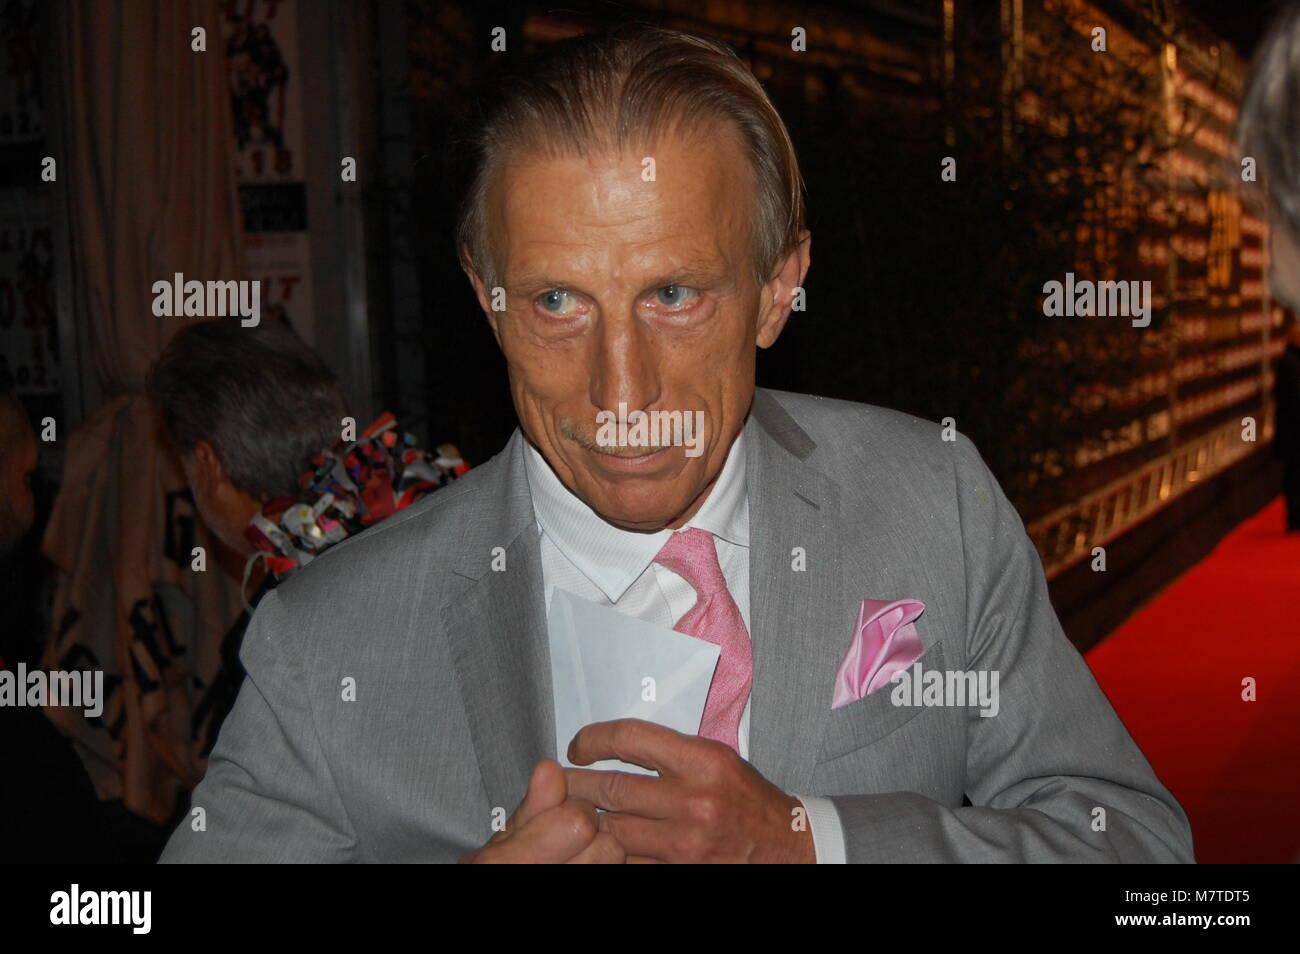 Fussballtrainer Christoph Daum LAMBERTZ MONDAY NIGHT 2018 - 29.01.2018 Wartesaal am Dom, Köln Stock Photo